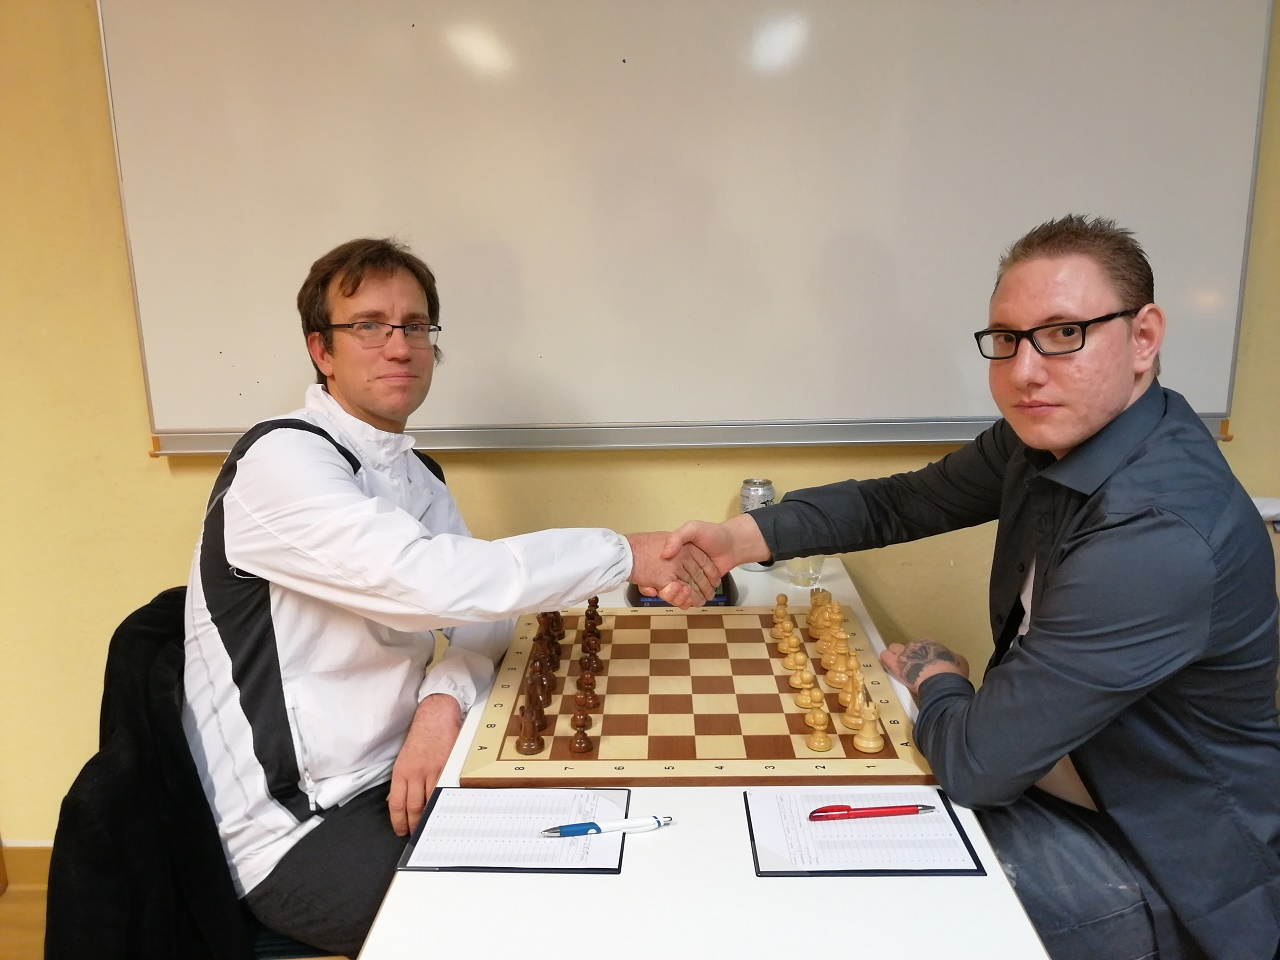 Bezirkspokal 2019 Runde 3 - Ralf Kissel gegen Pascal Gerhardt